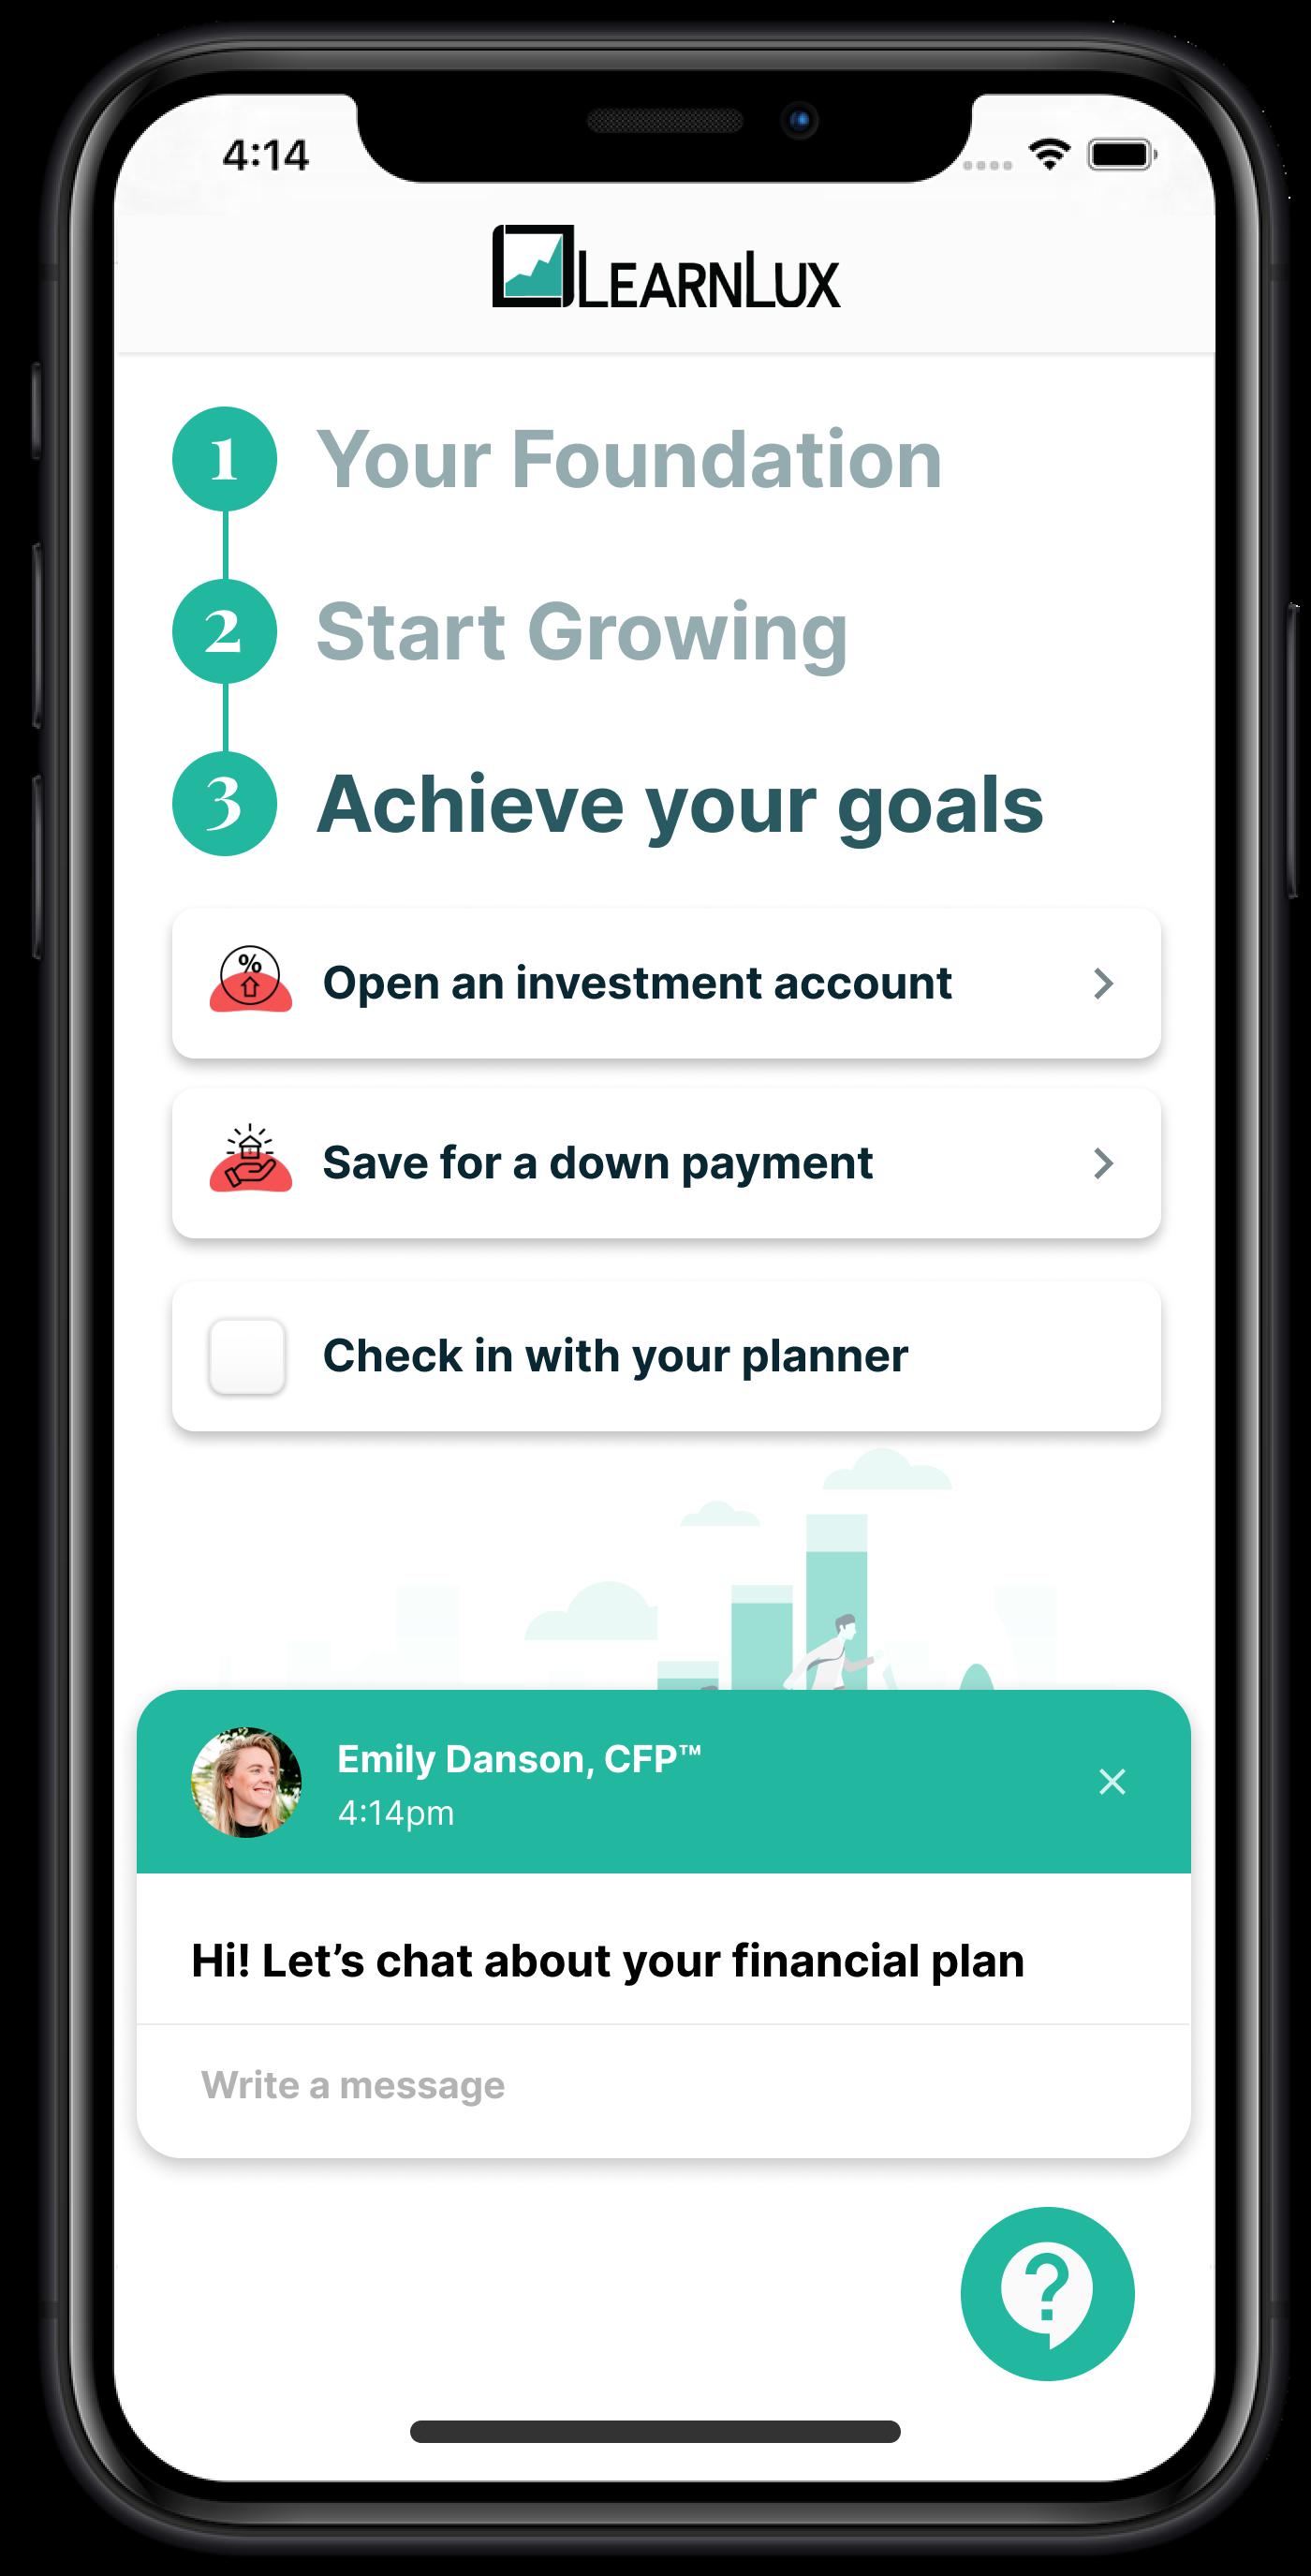 Black iPhone with LearnLux financial wellbeing program screenshot inside